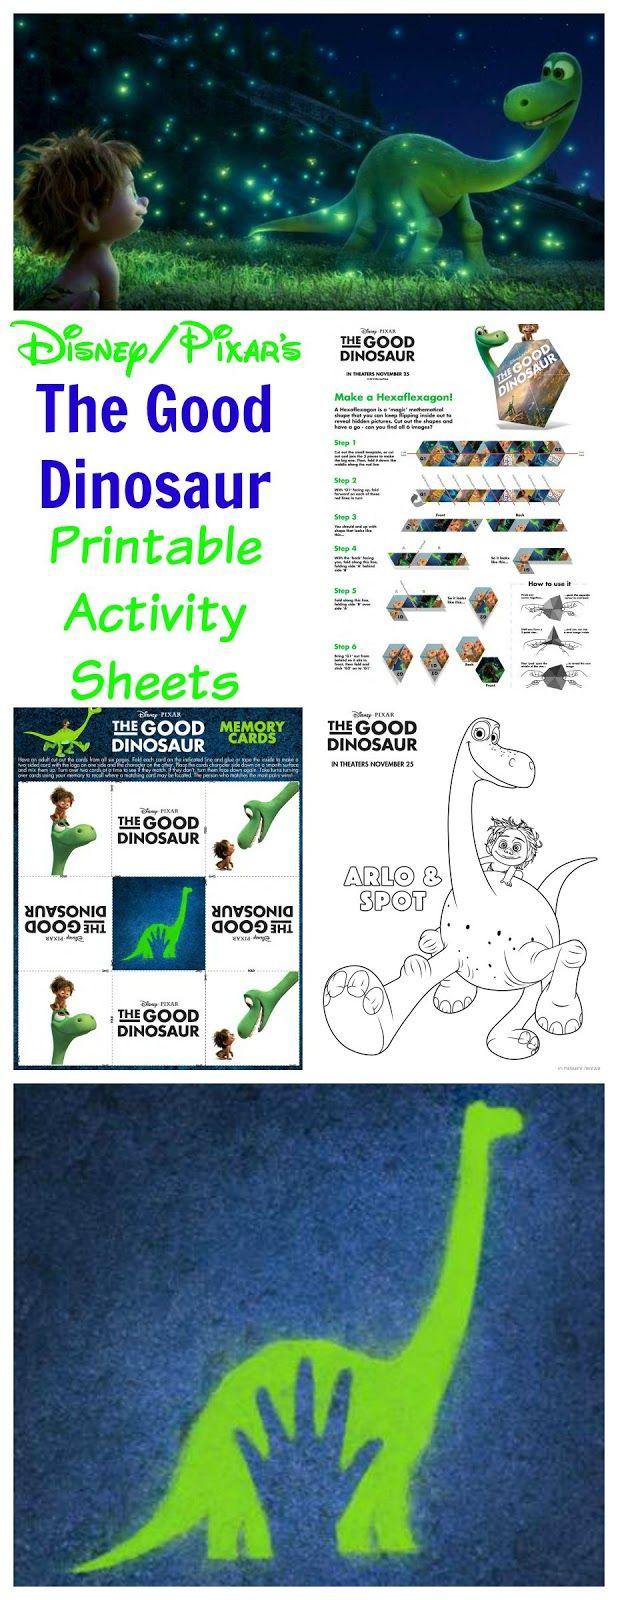 A New Dawnn: Disney/Pixar's The Good Dinosaur FREE Printable Activity Sheets